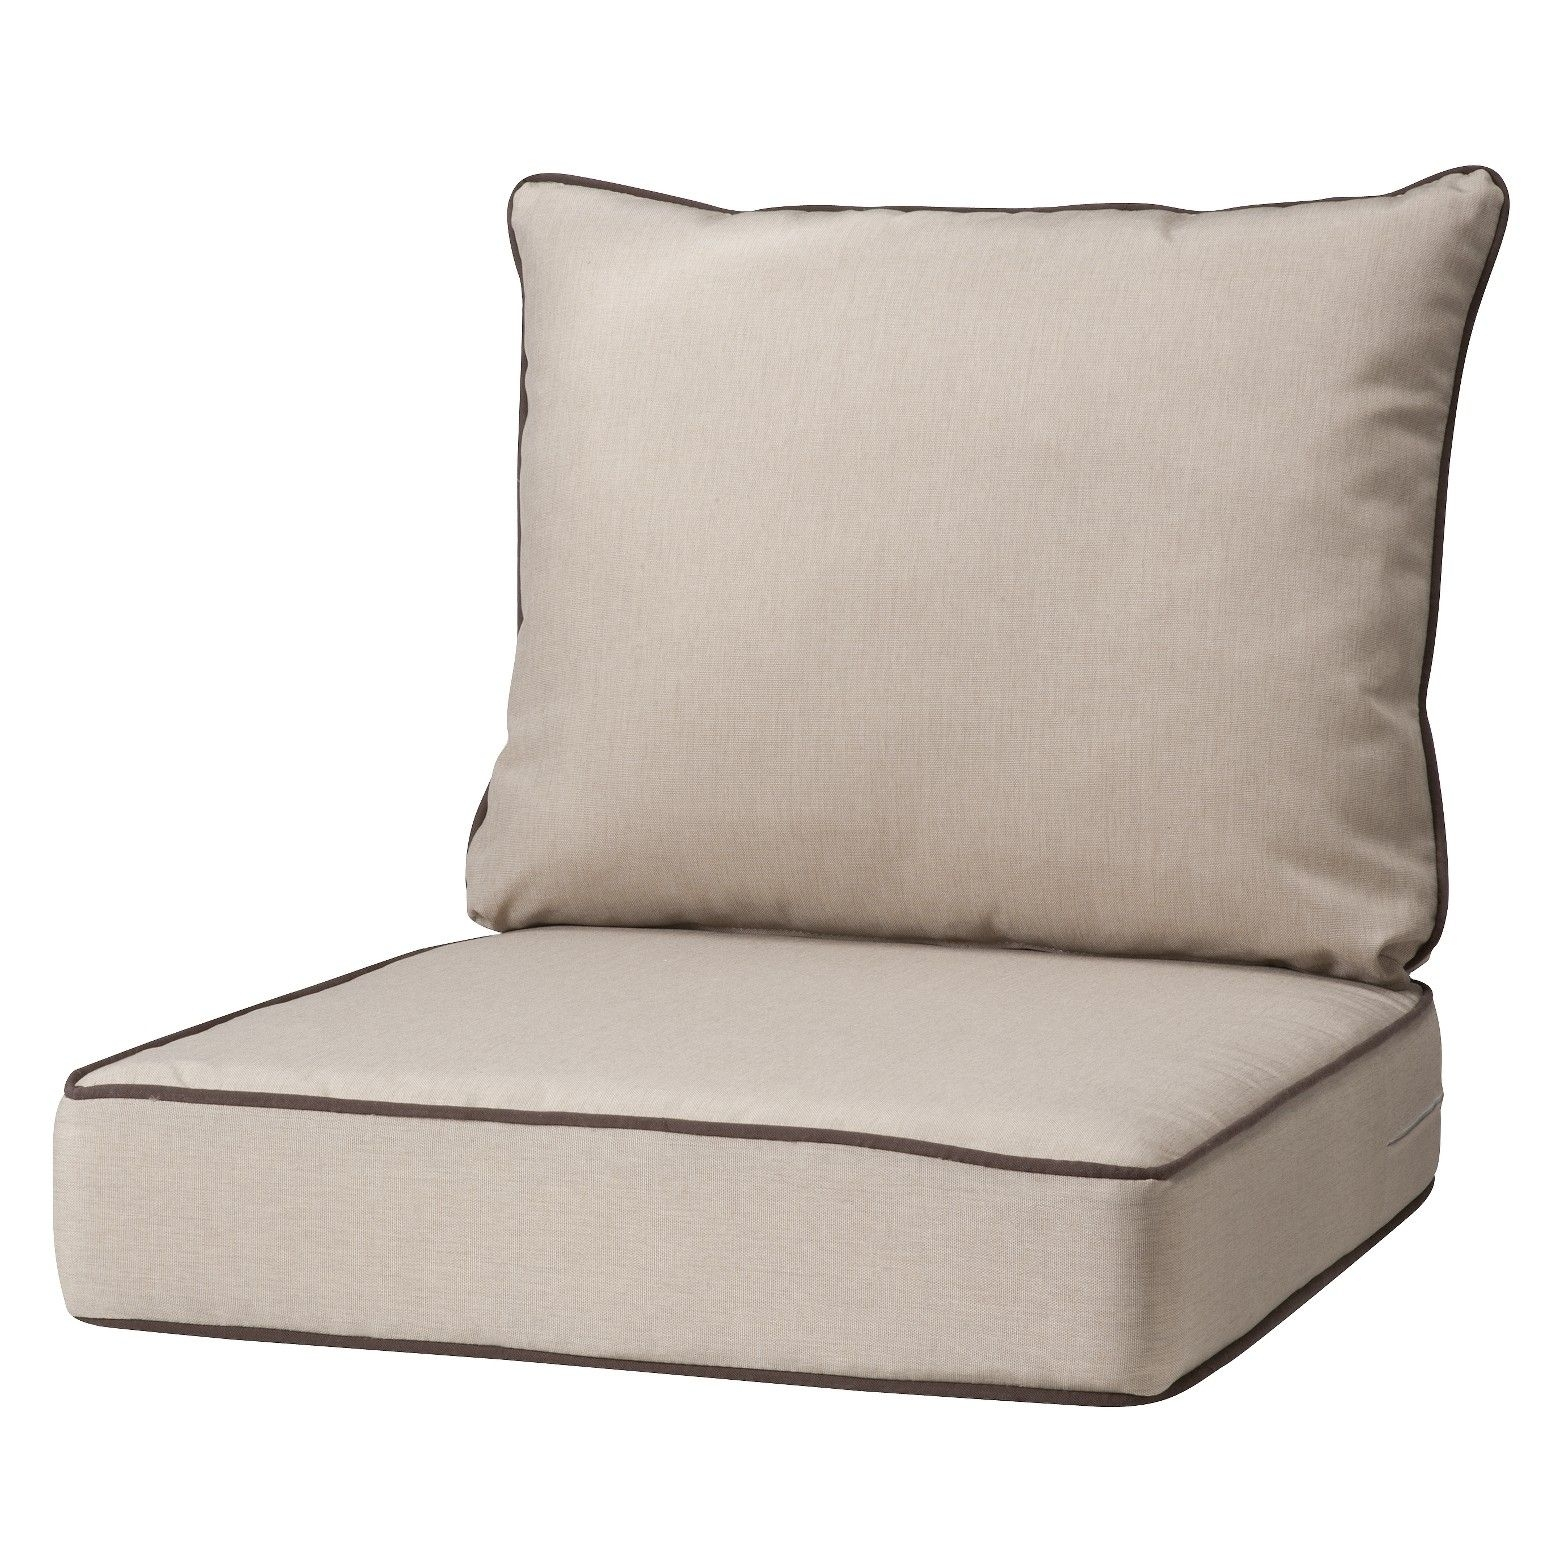 Threshold Patio Cushions